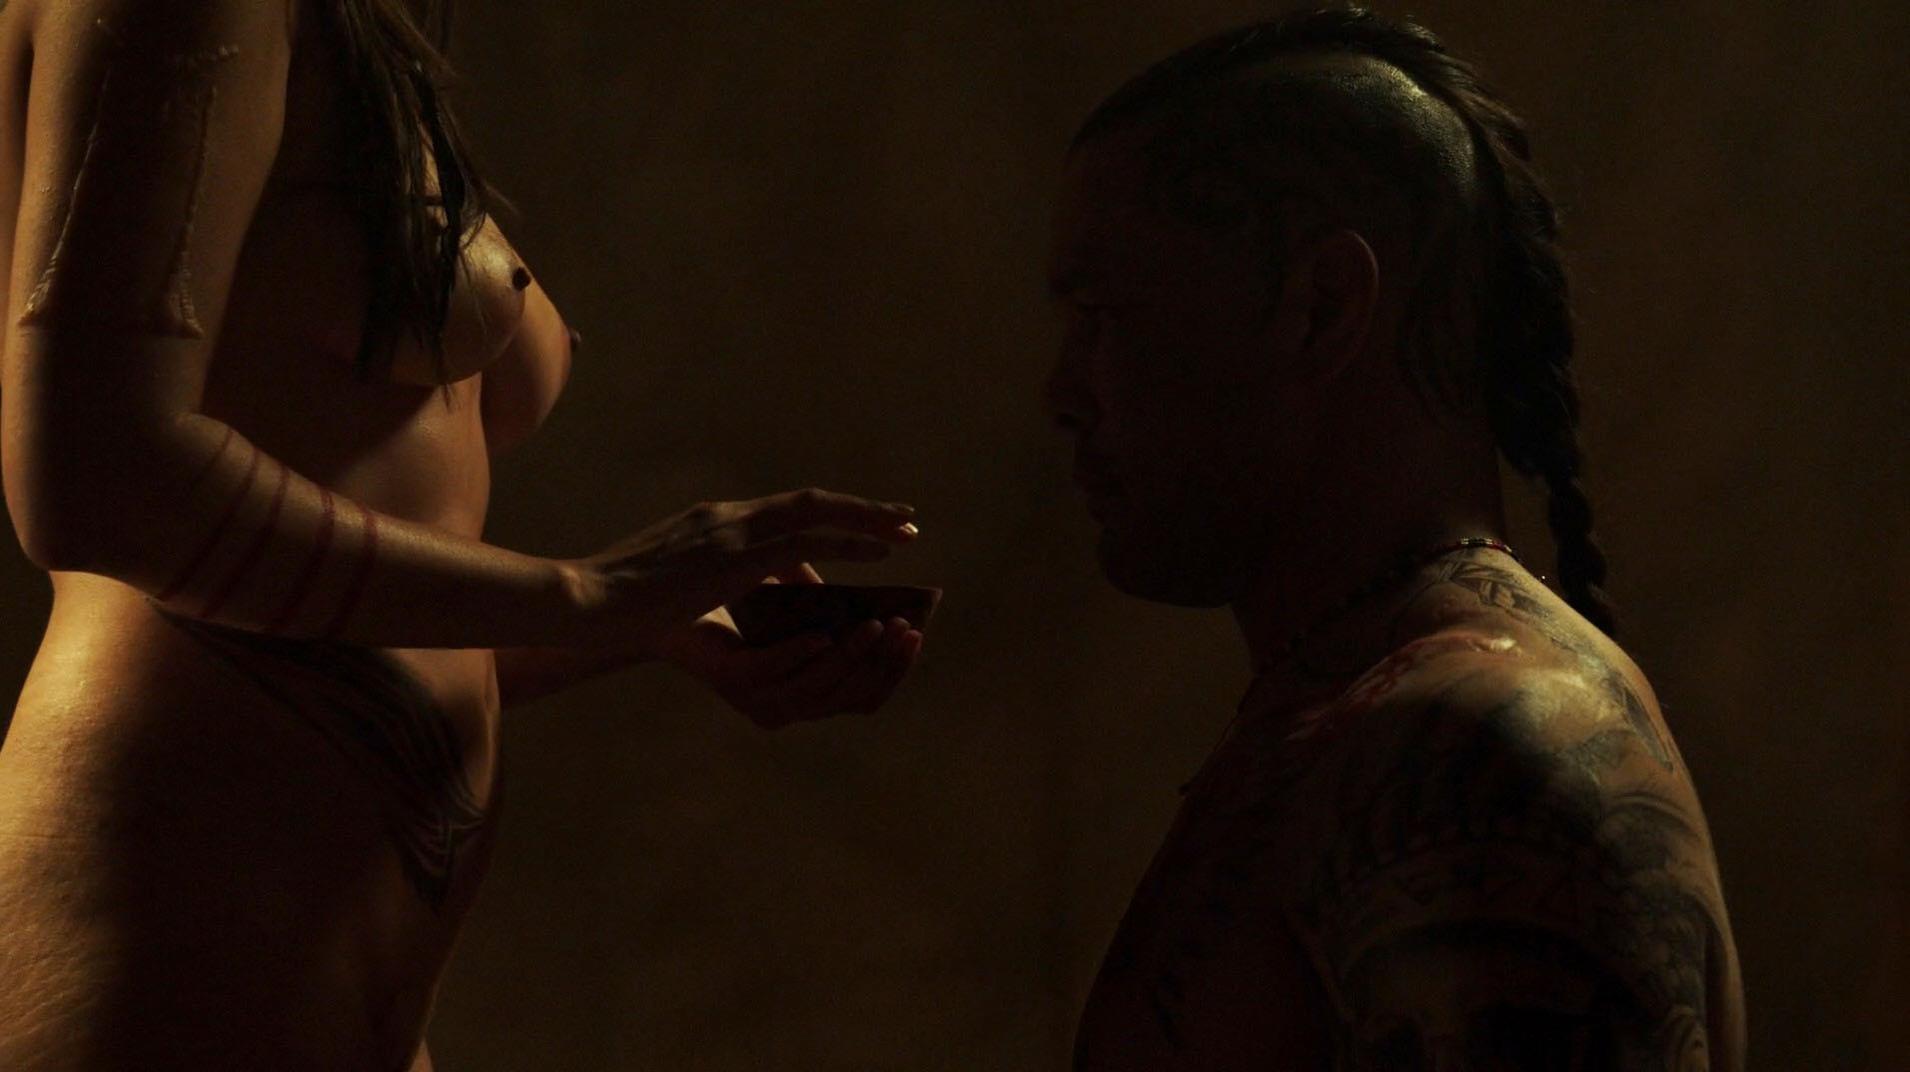 Lili Simmons sexy, Drea Garcia nude, Trinity Wright nude - Banshee s03e02 (2015)